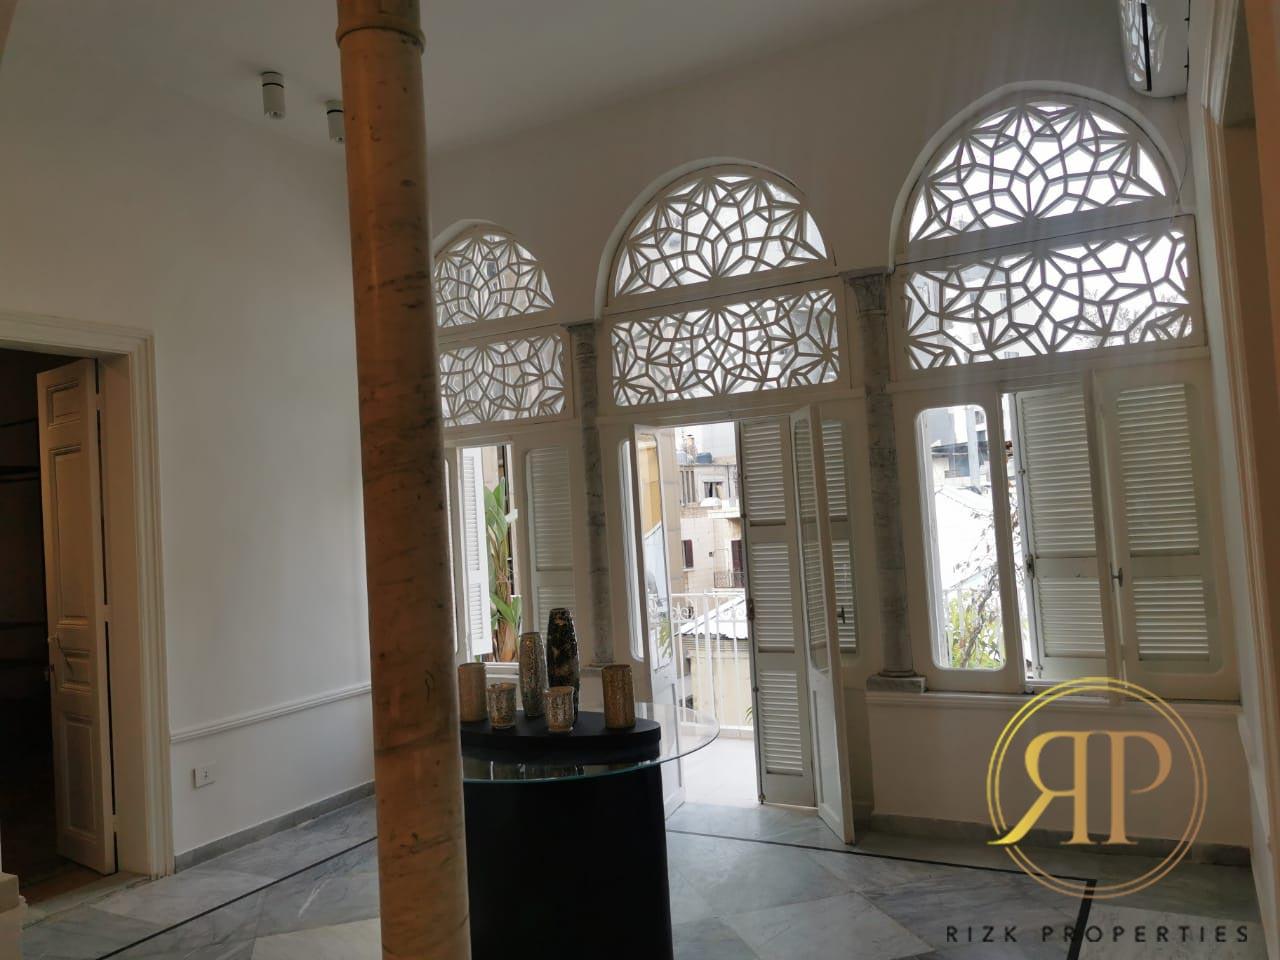 Apartment in Beirut, Gemmayzeh  - Catchy deal!